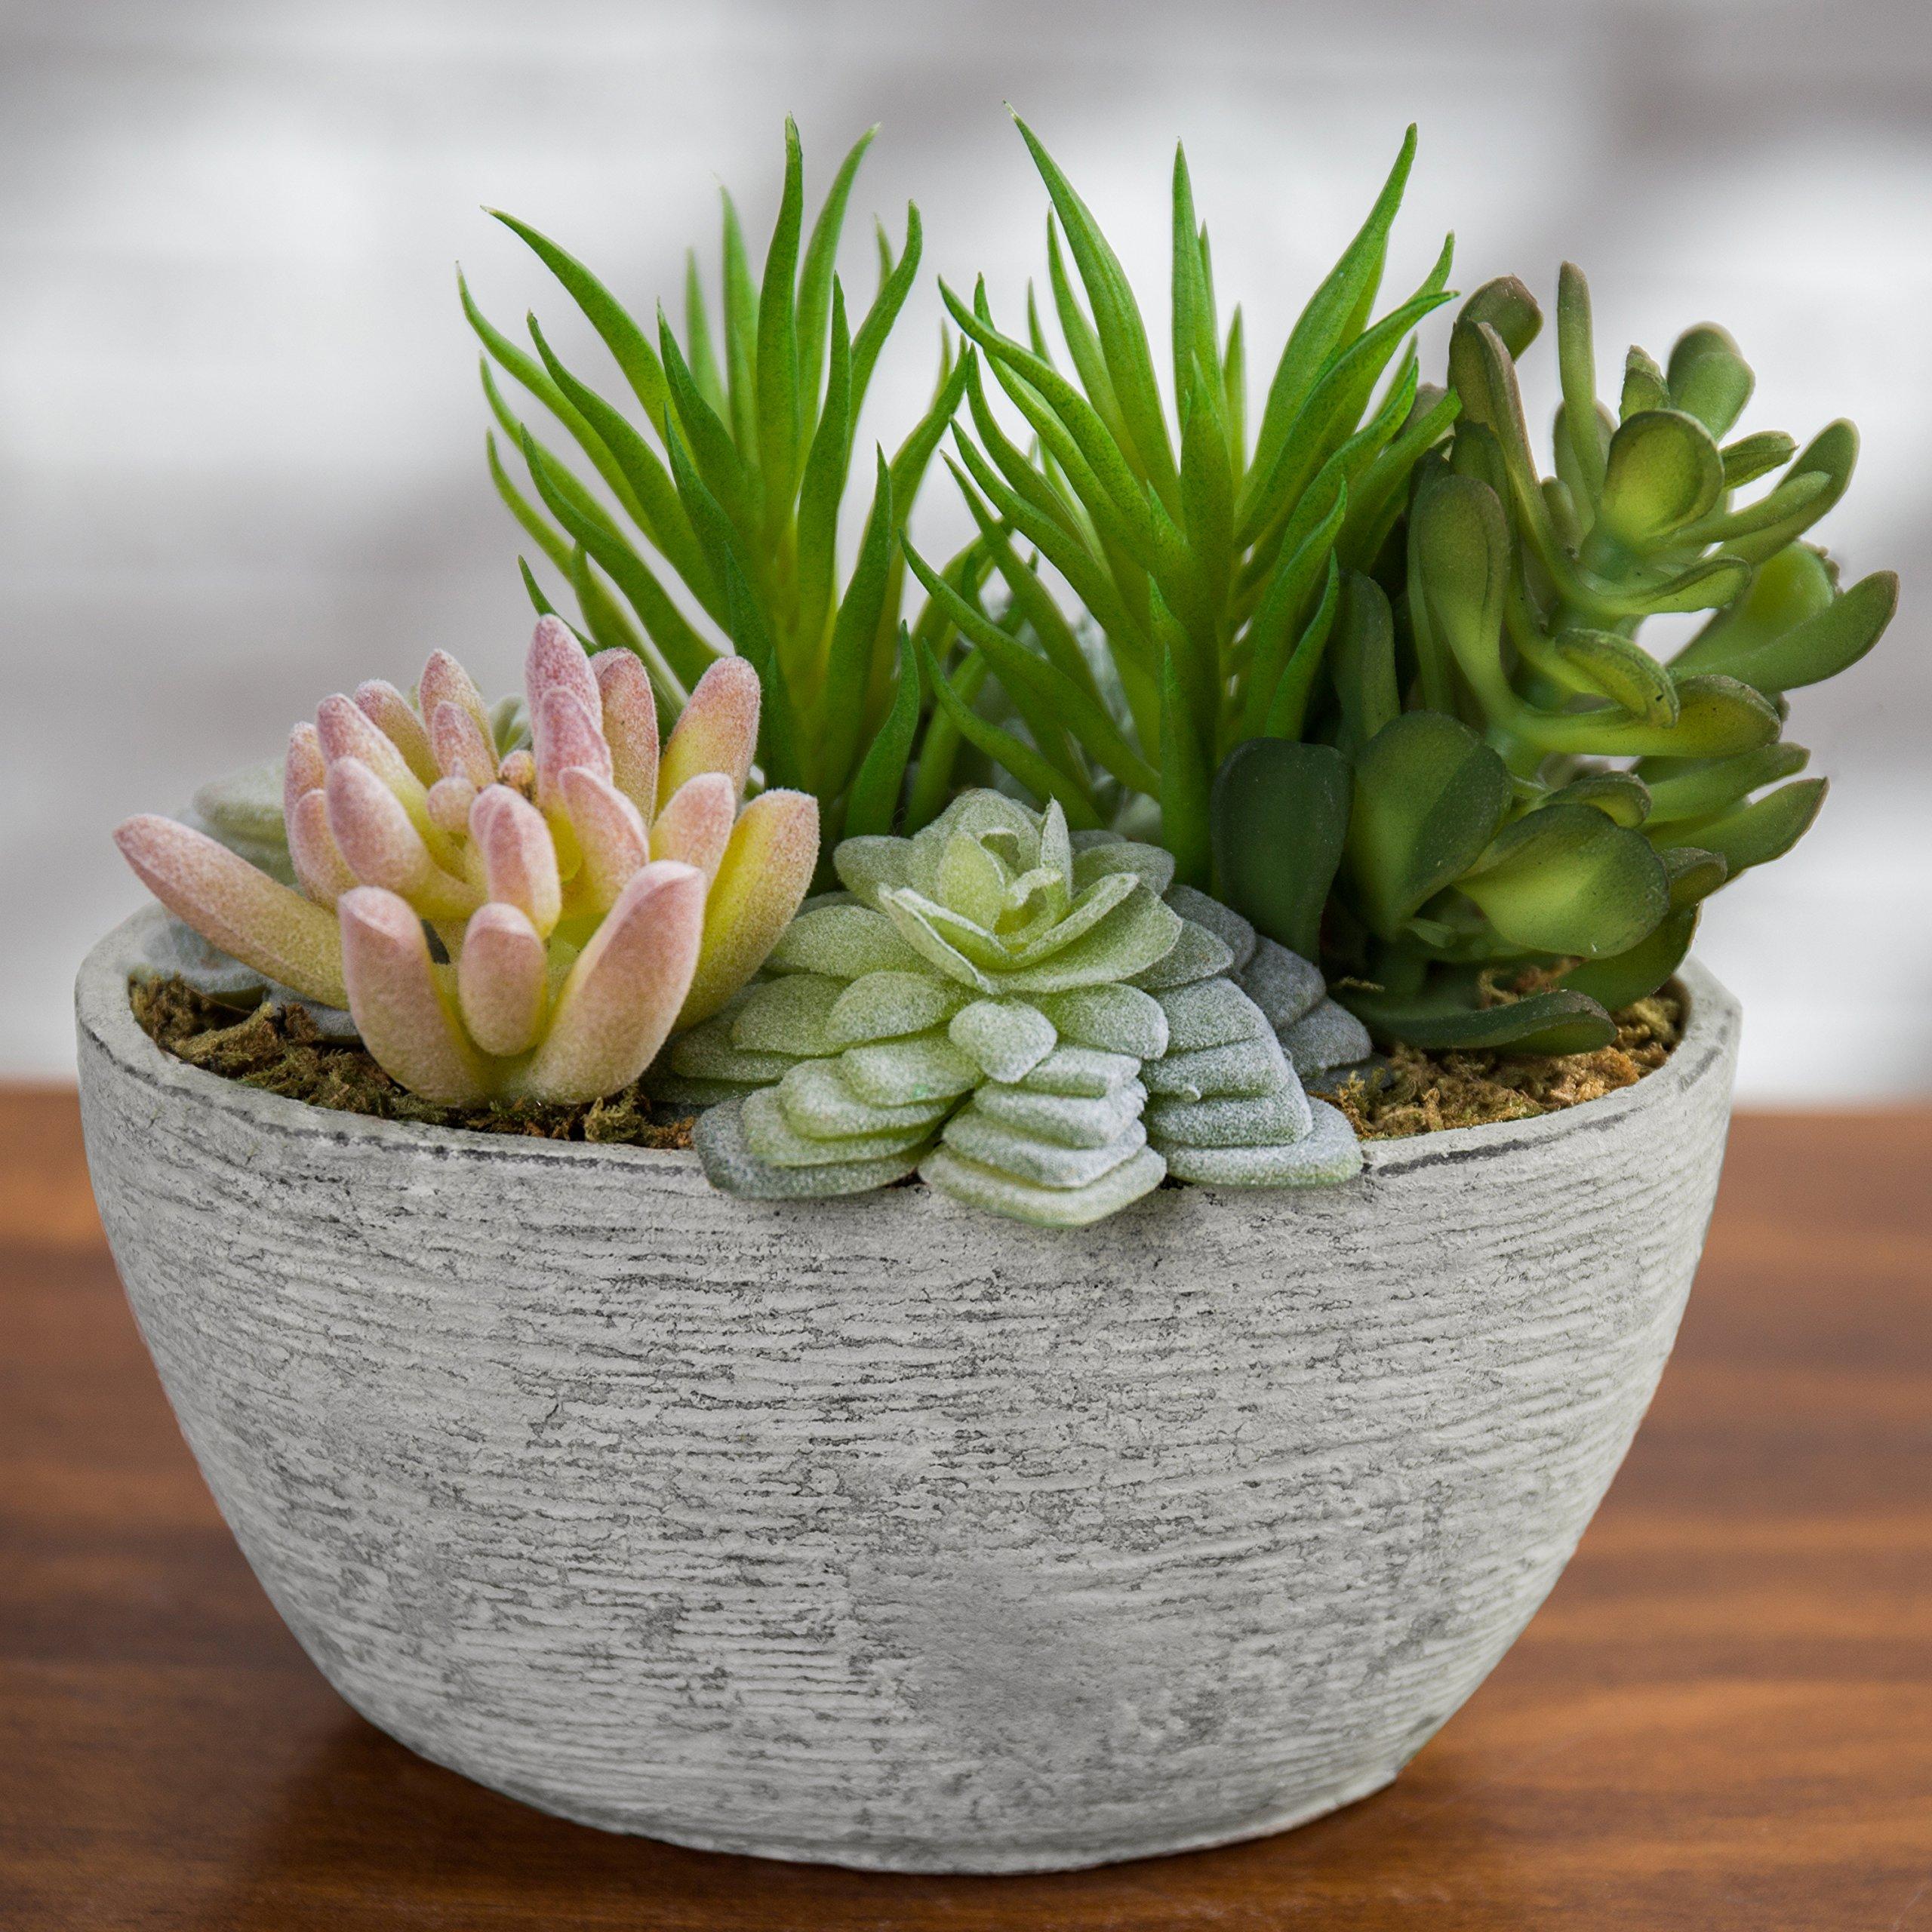 MyGift Tabletop Artificial Succulent Arrangement in Eco-Friendly Pulp Planter Pot